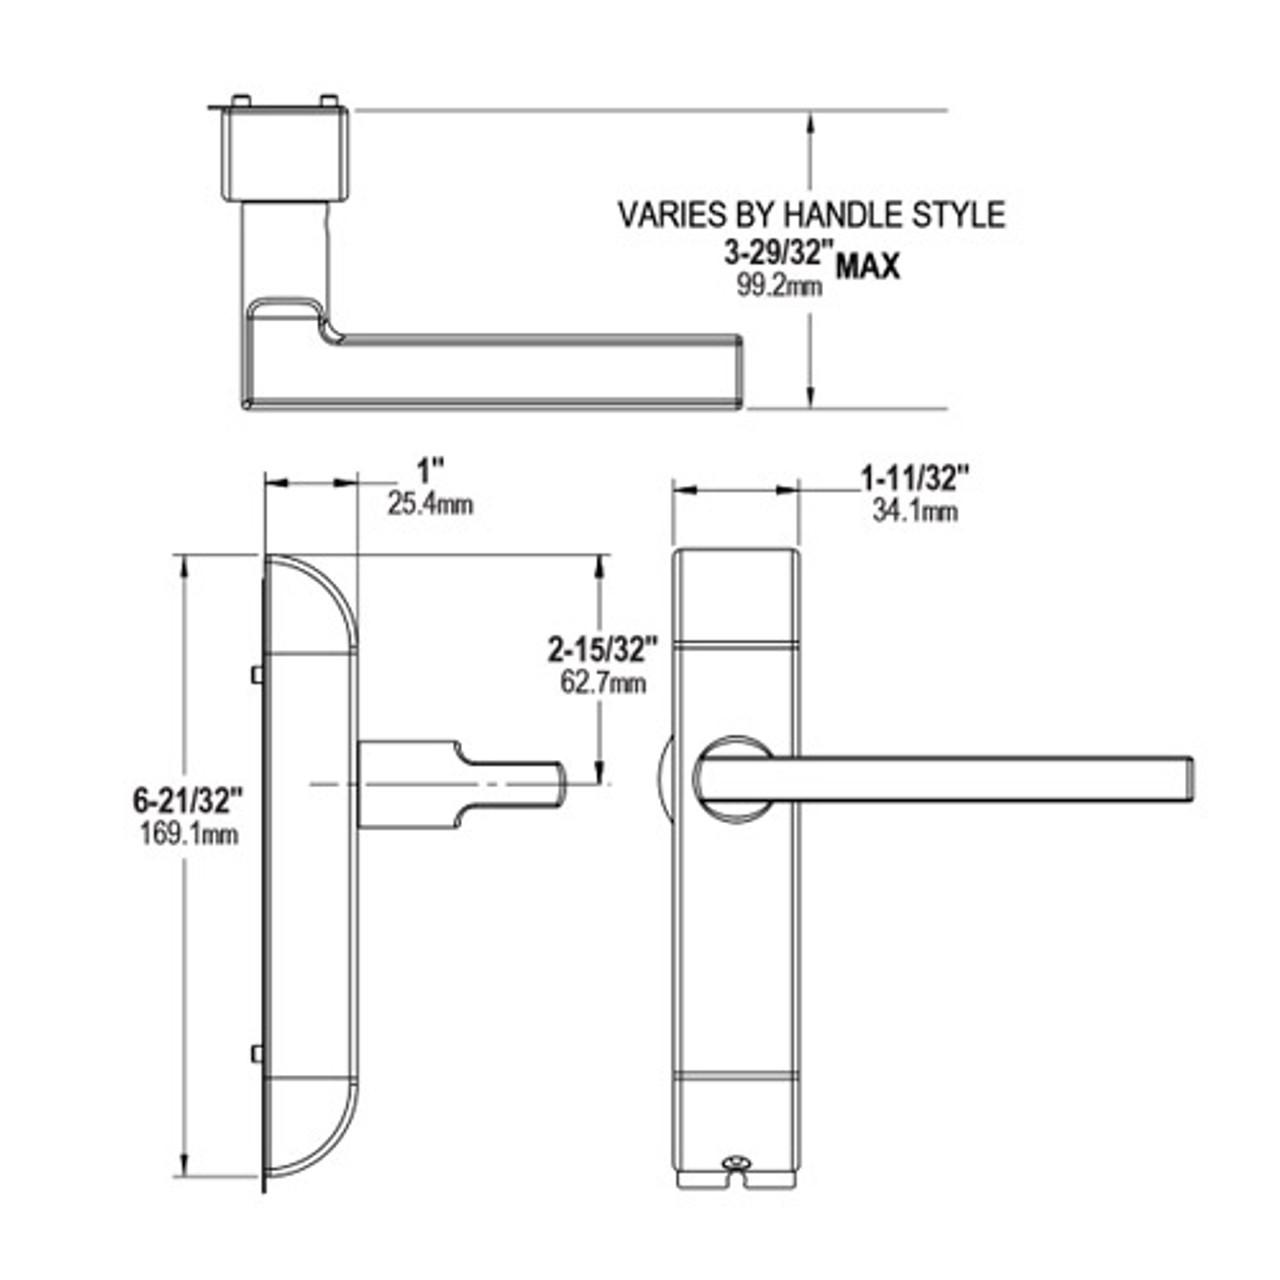 4600-MD-611-US3 Adams Rite MD Designer handle Dimensional View